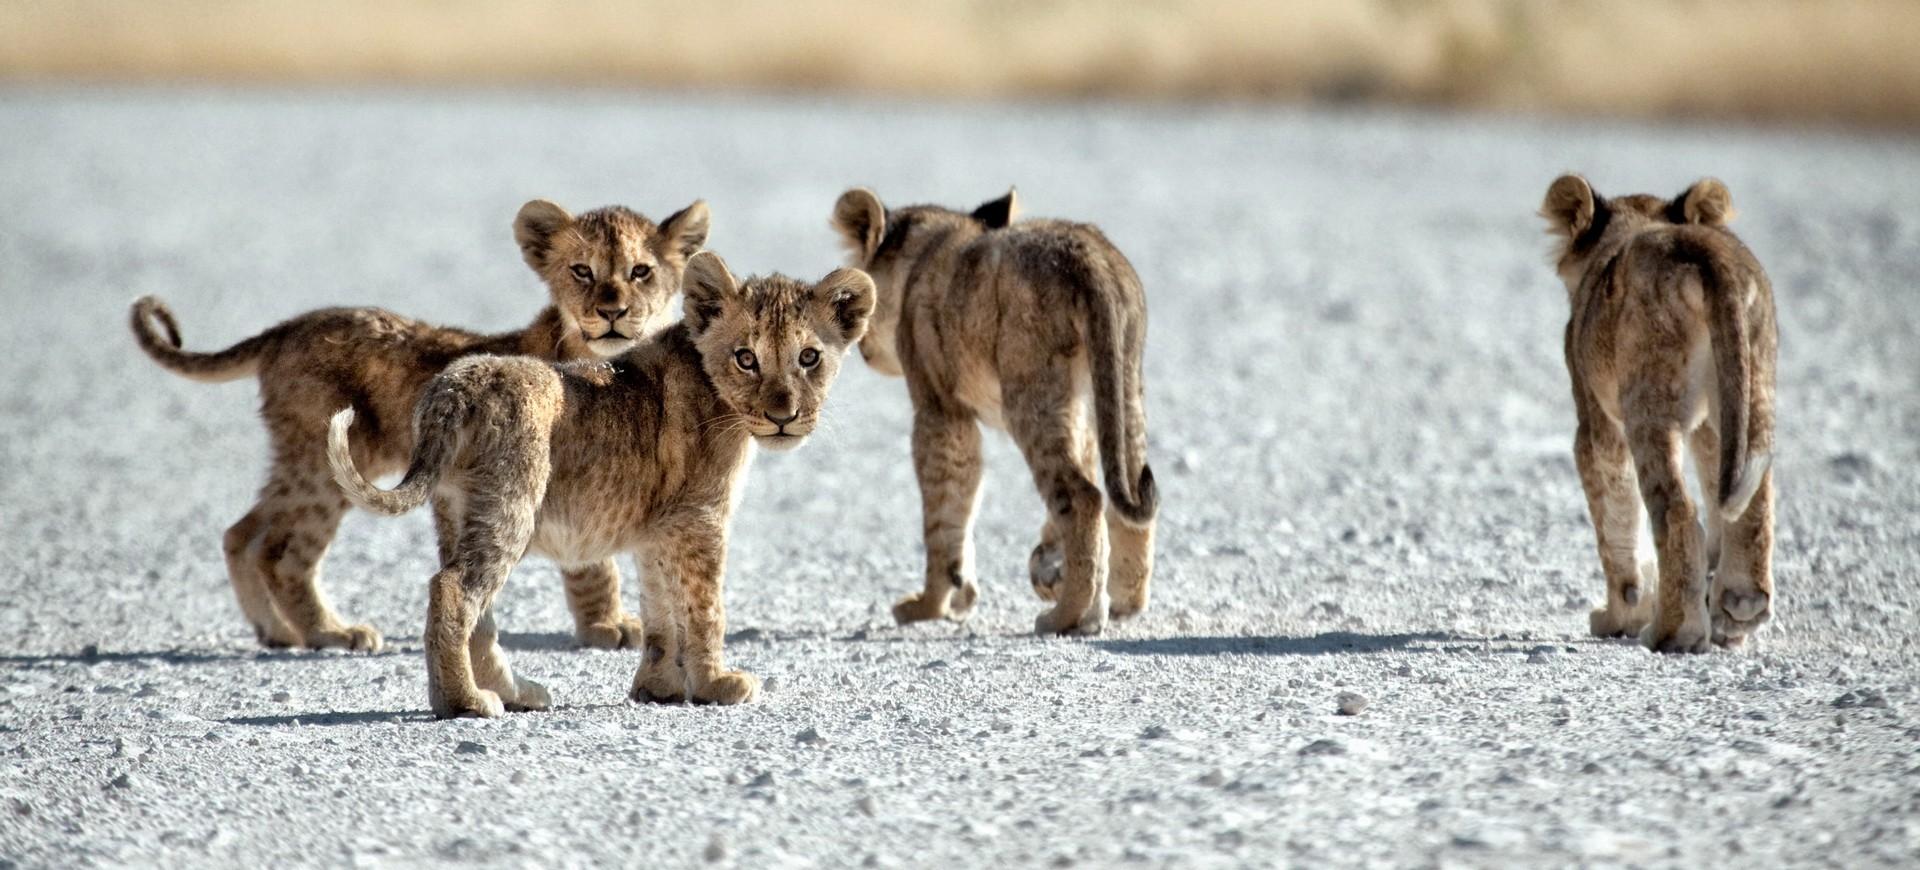 Namibie Etosha Lionceaux